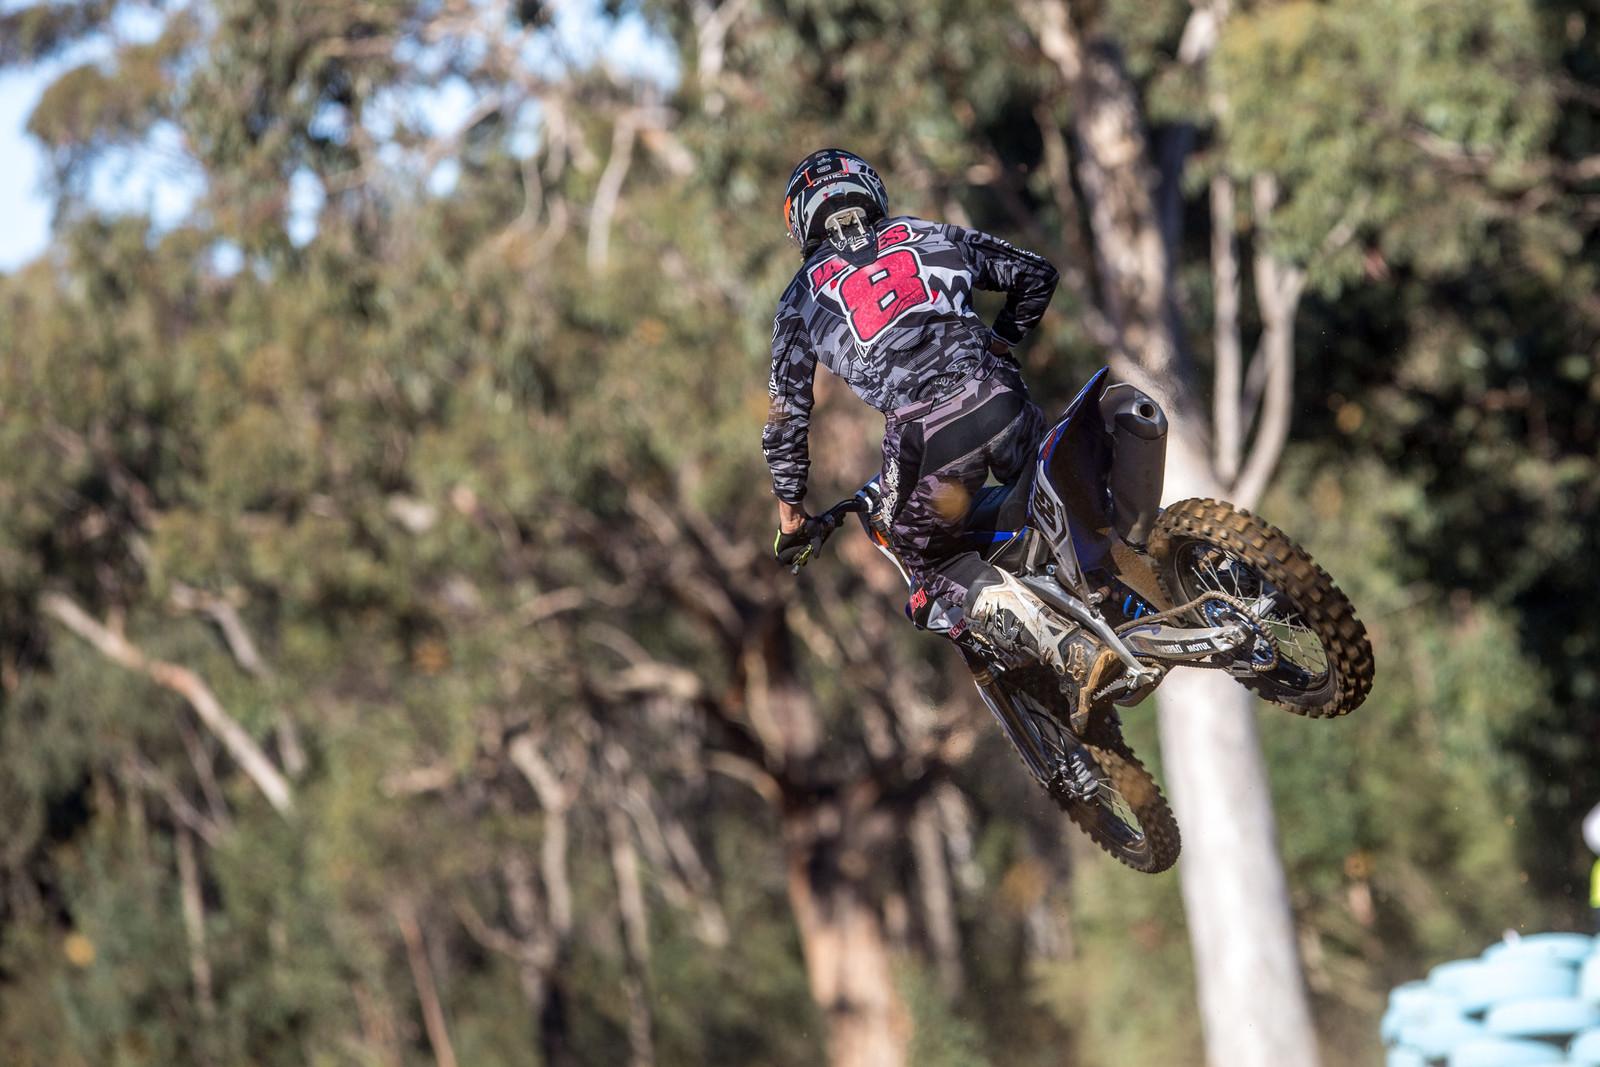 Corey James - Australian Motul MX Championships: Round 6, Nowra - Motocross Pictures - Vital MX